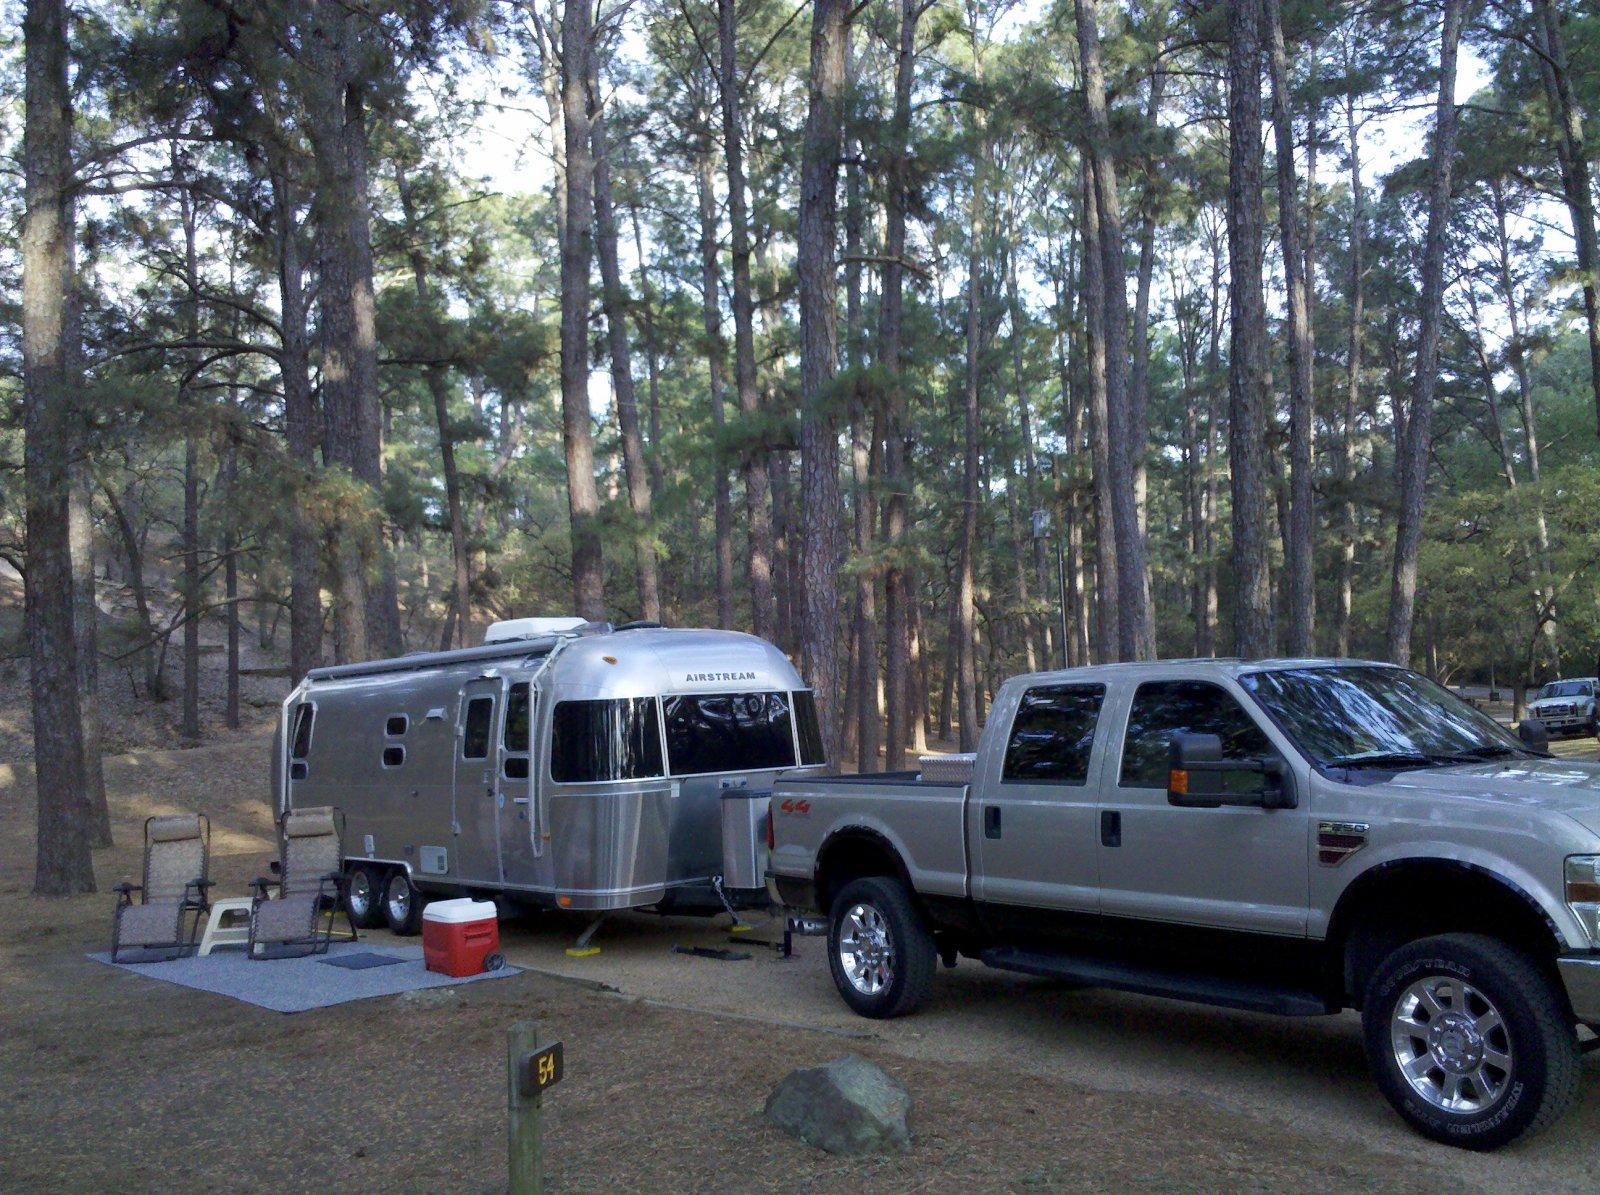 Click image for larger version  Name:Bastrop State Park 1.jpg.jpg Views:120 Size:489.1 KB ID:125638